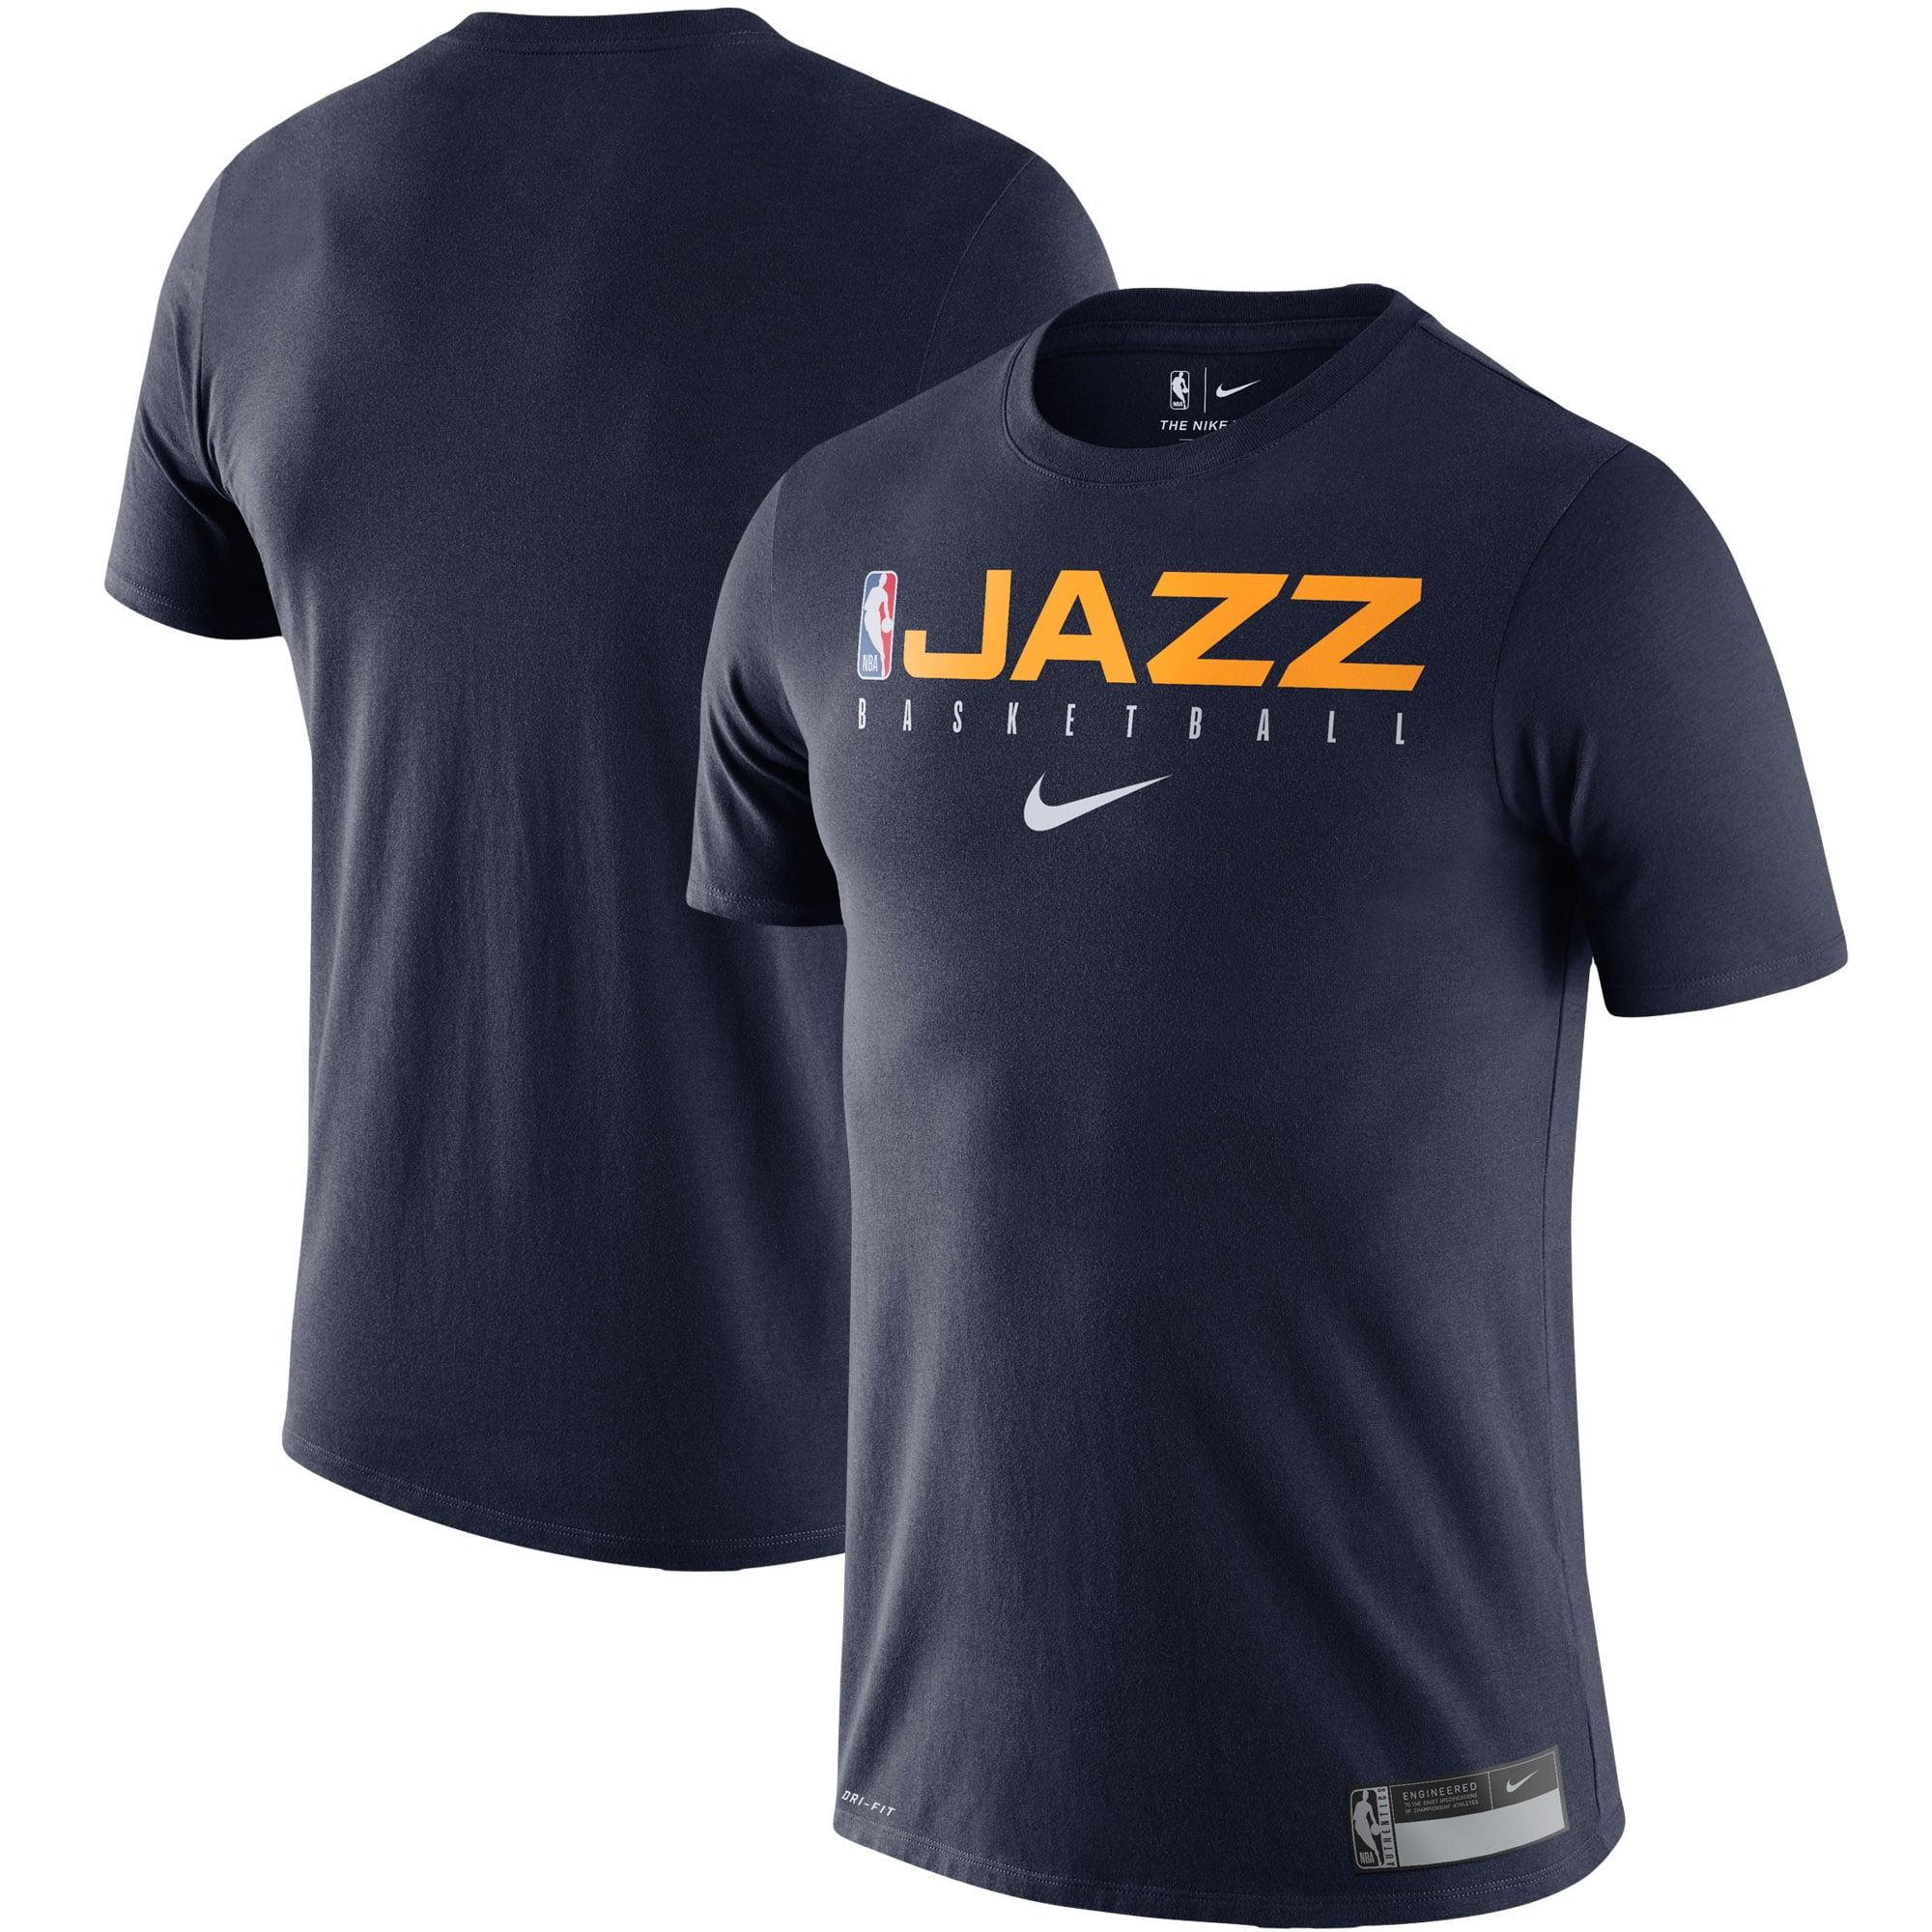 Utah Jazz Nike Essential Practice Performance T-Shirt - Navy